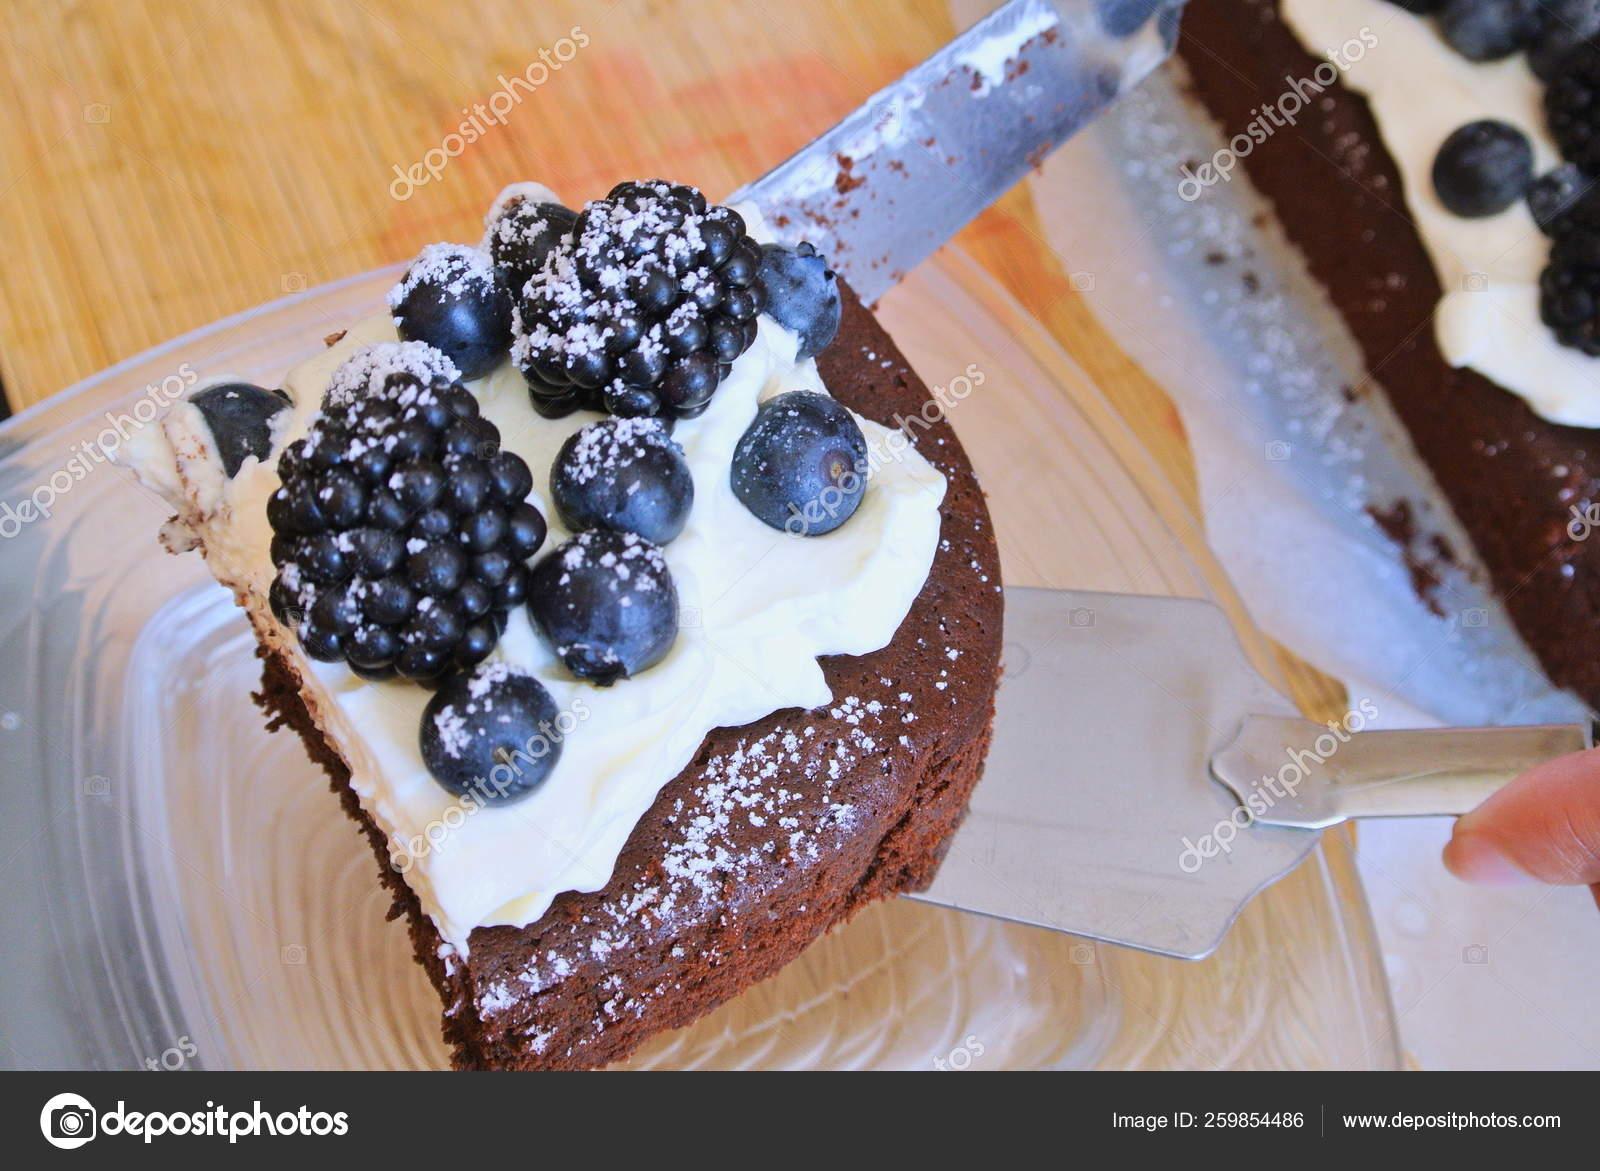 joint-stock investment commercial bank novaya moskva torta